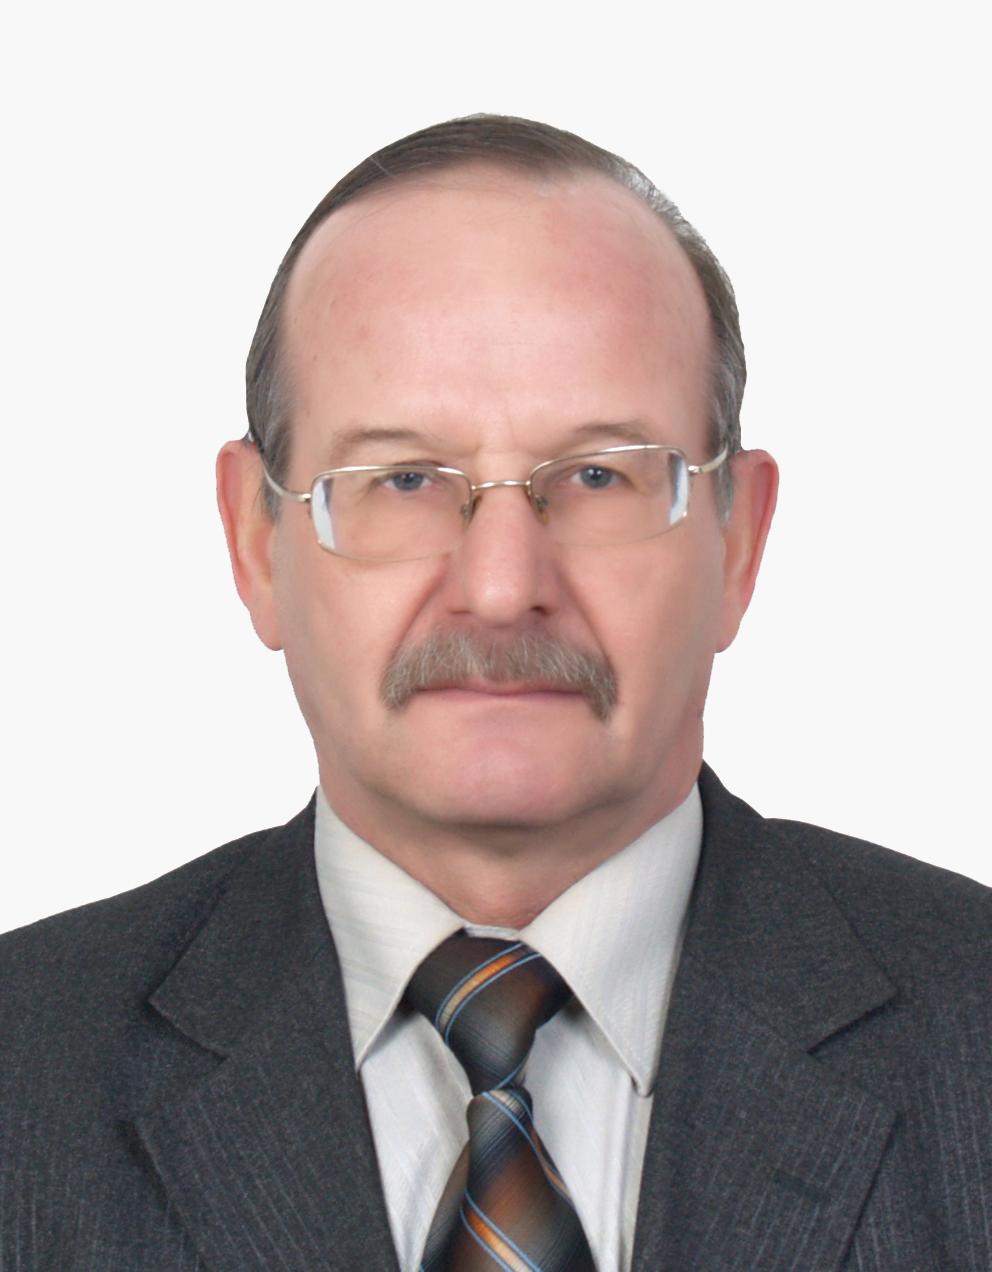 Володимир Павлович Манаков